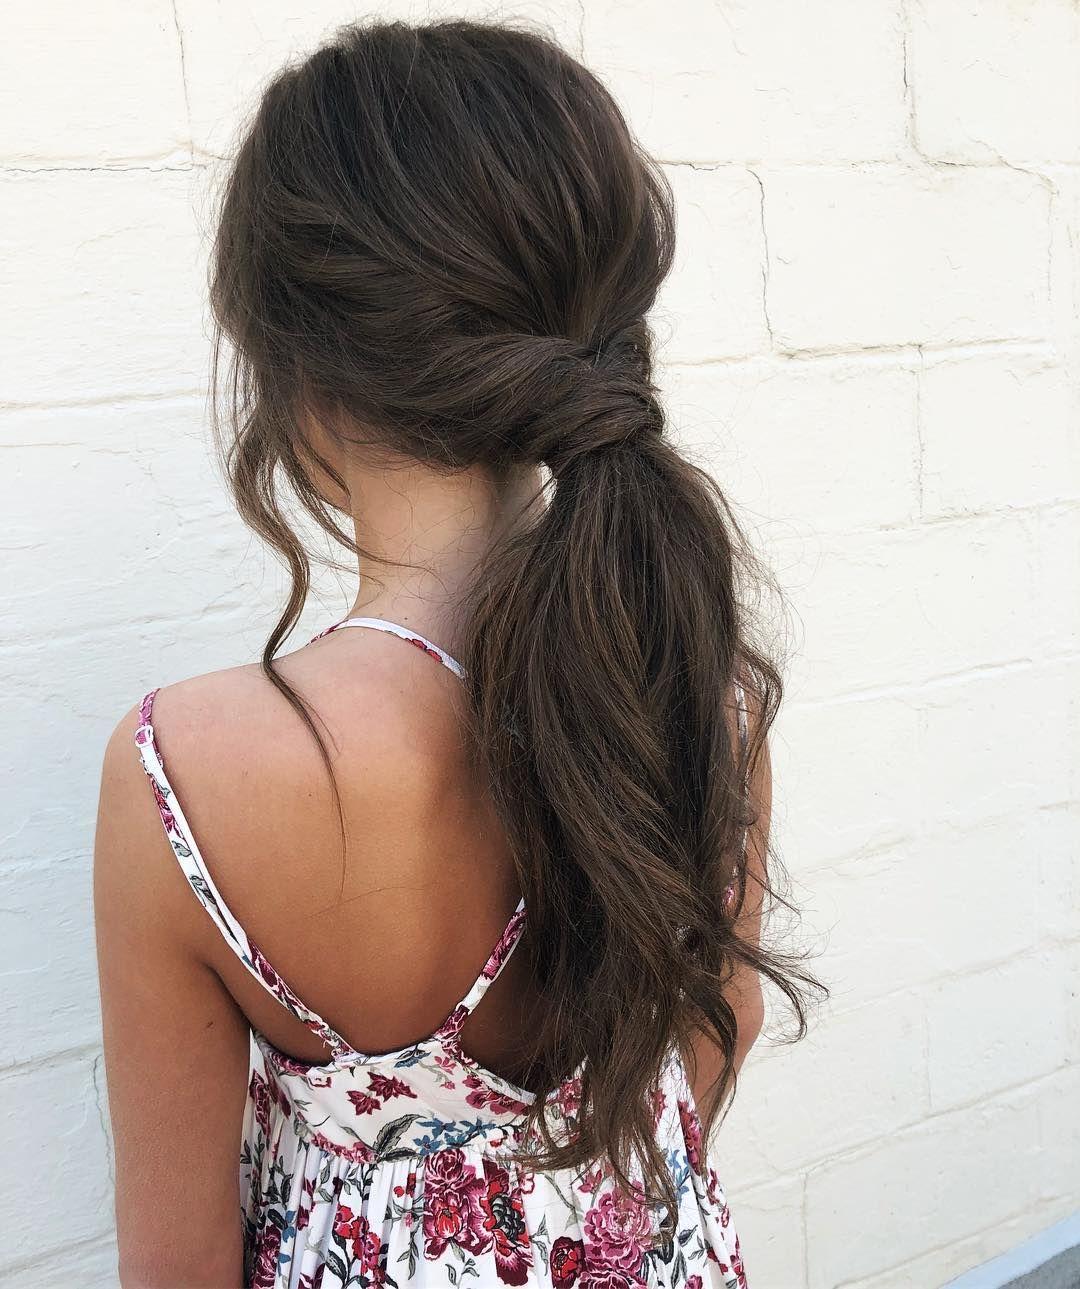 Ponytail hairstyle weddinghair hairstyle halfup wedding hairdos